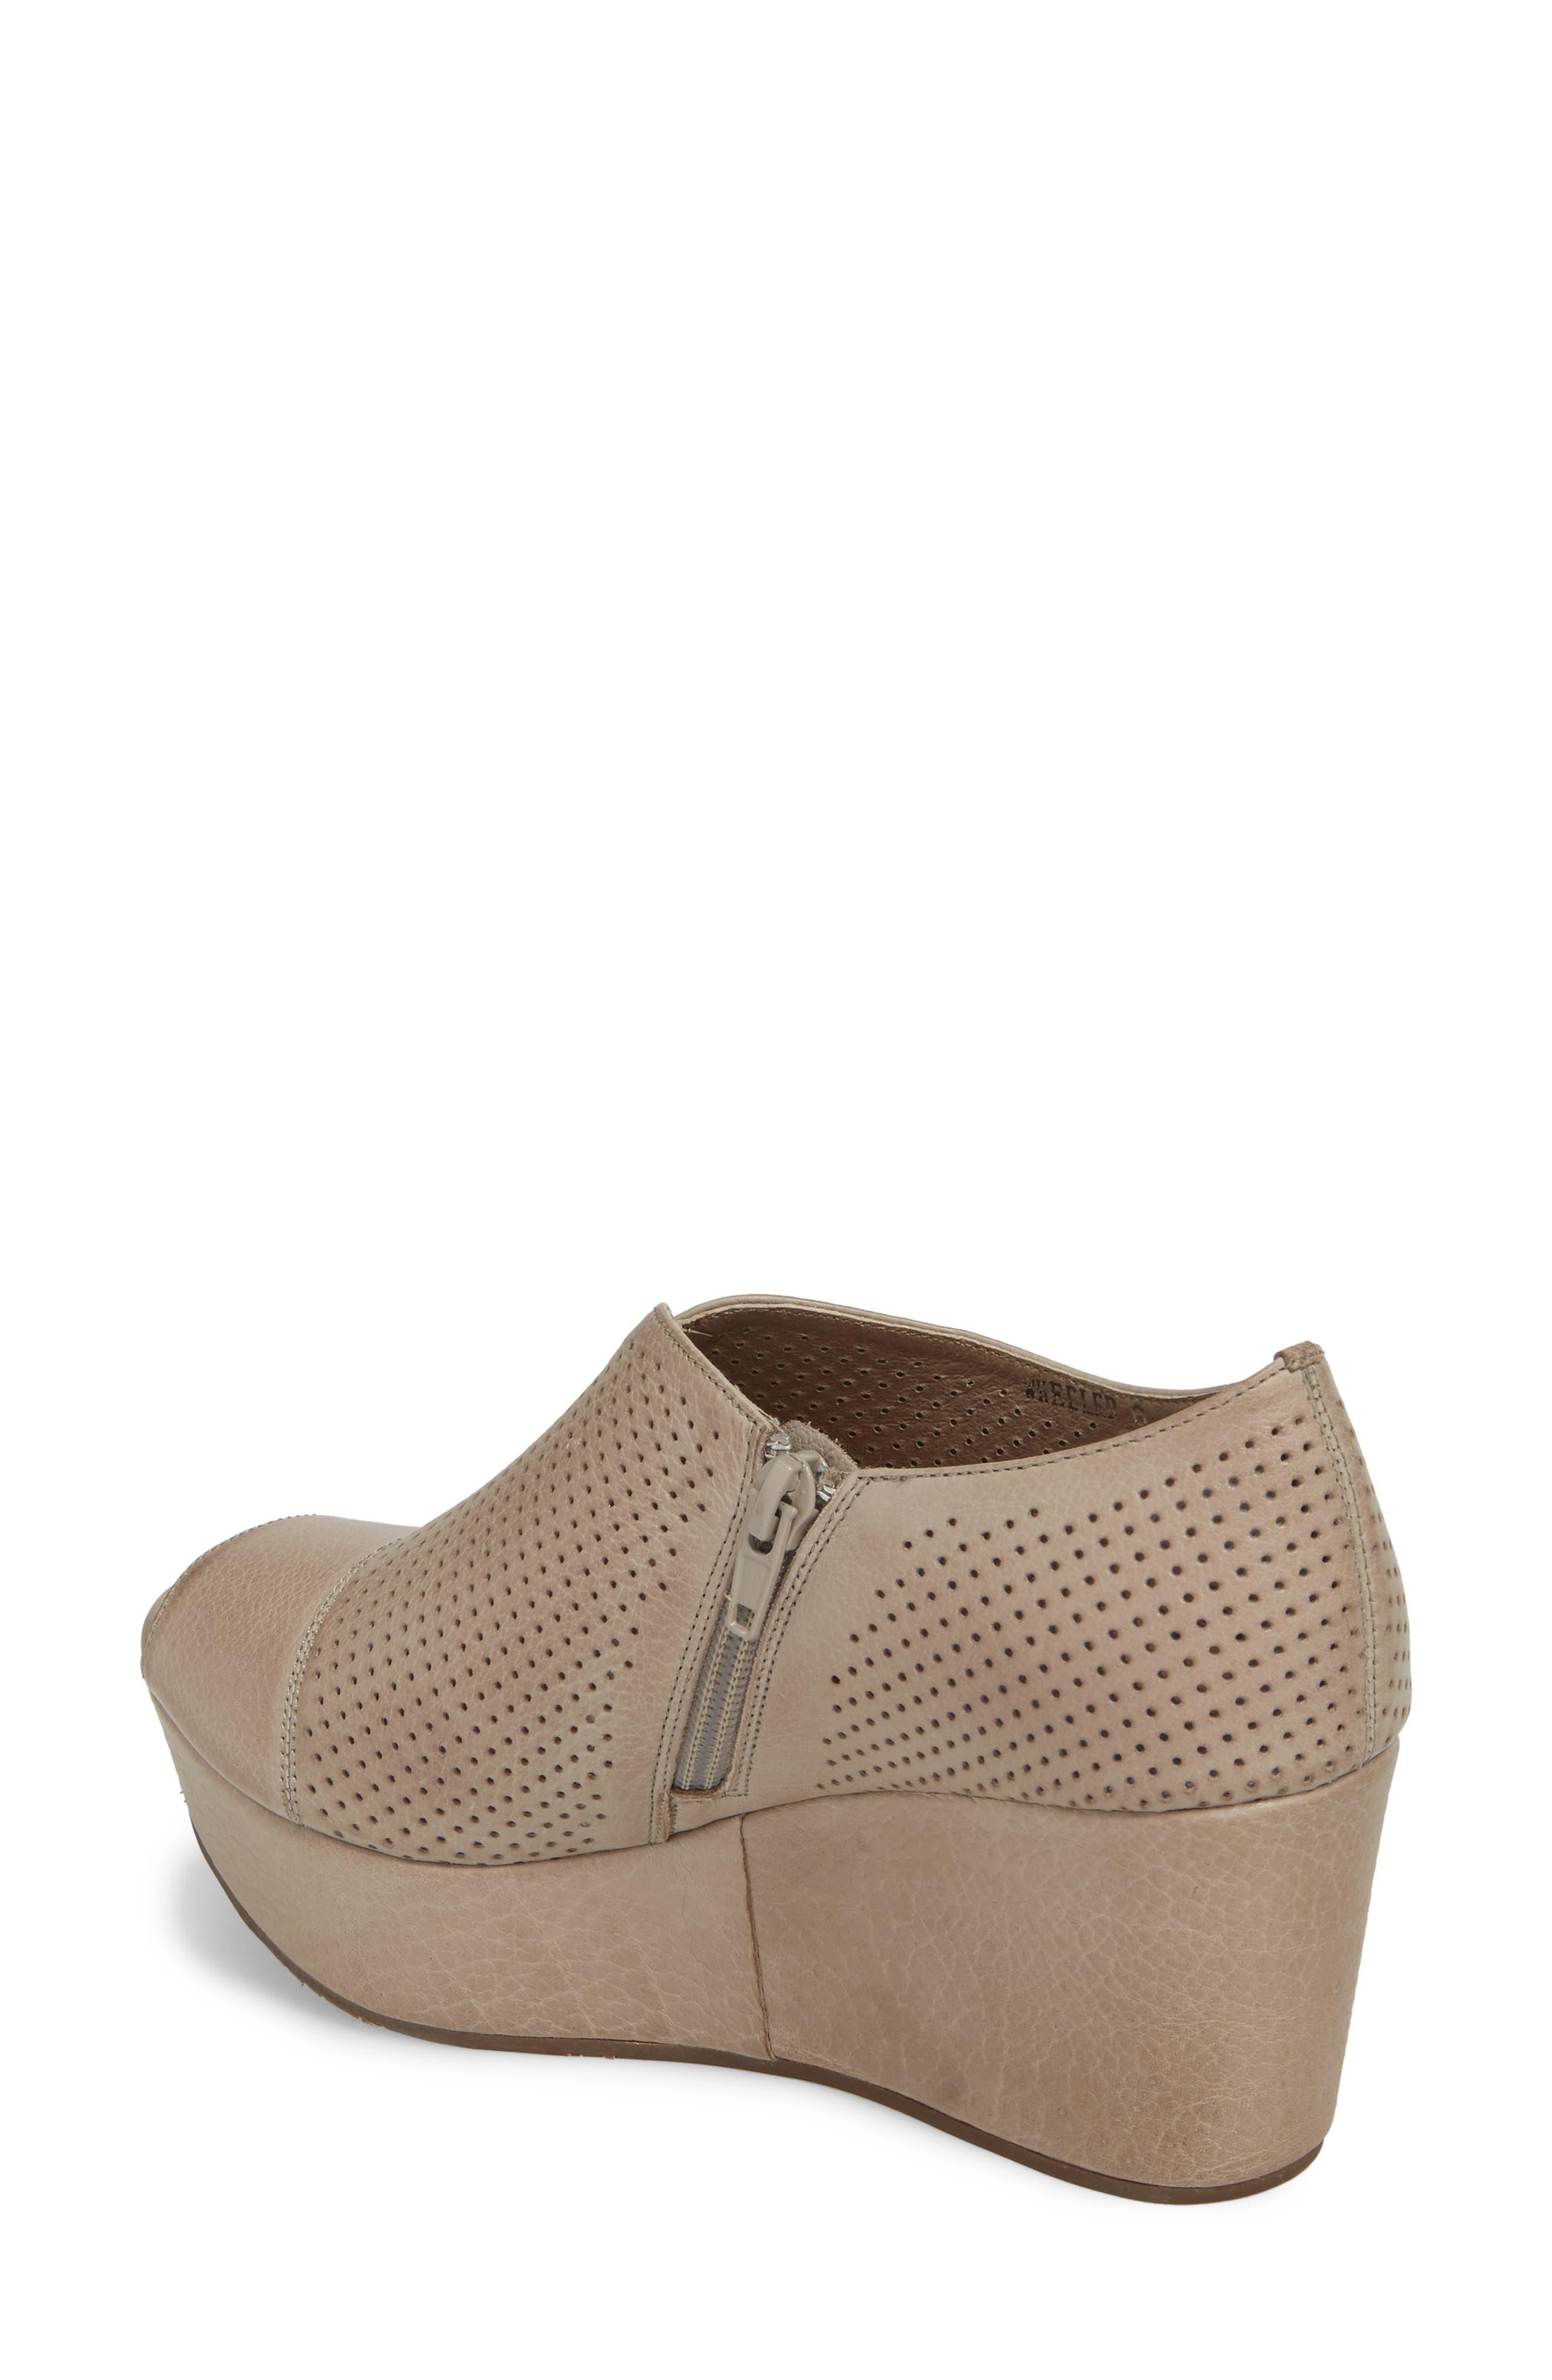 Wheeler Wedge Sandal,                             Alternate thumbnail 2, color,                             Grey Leather